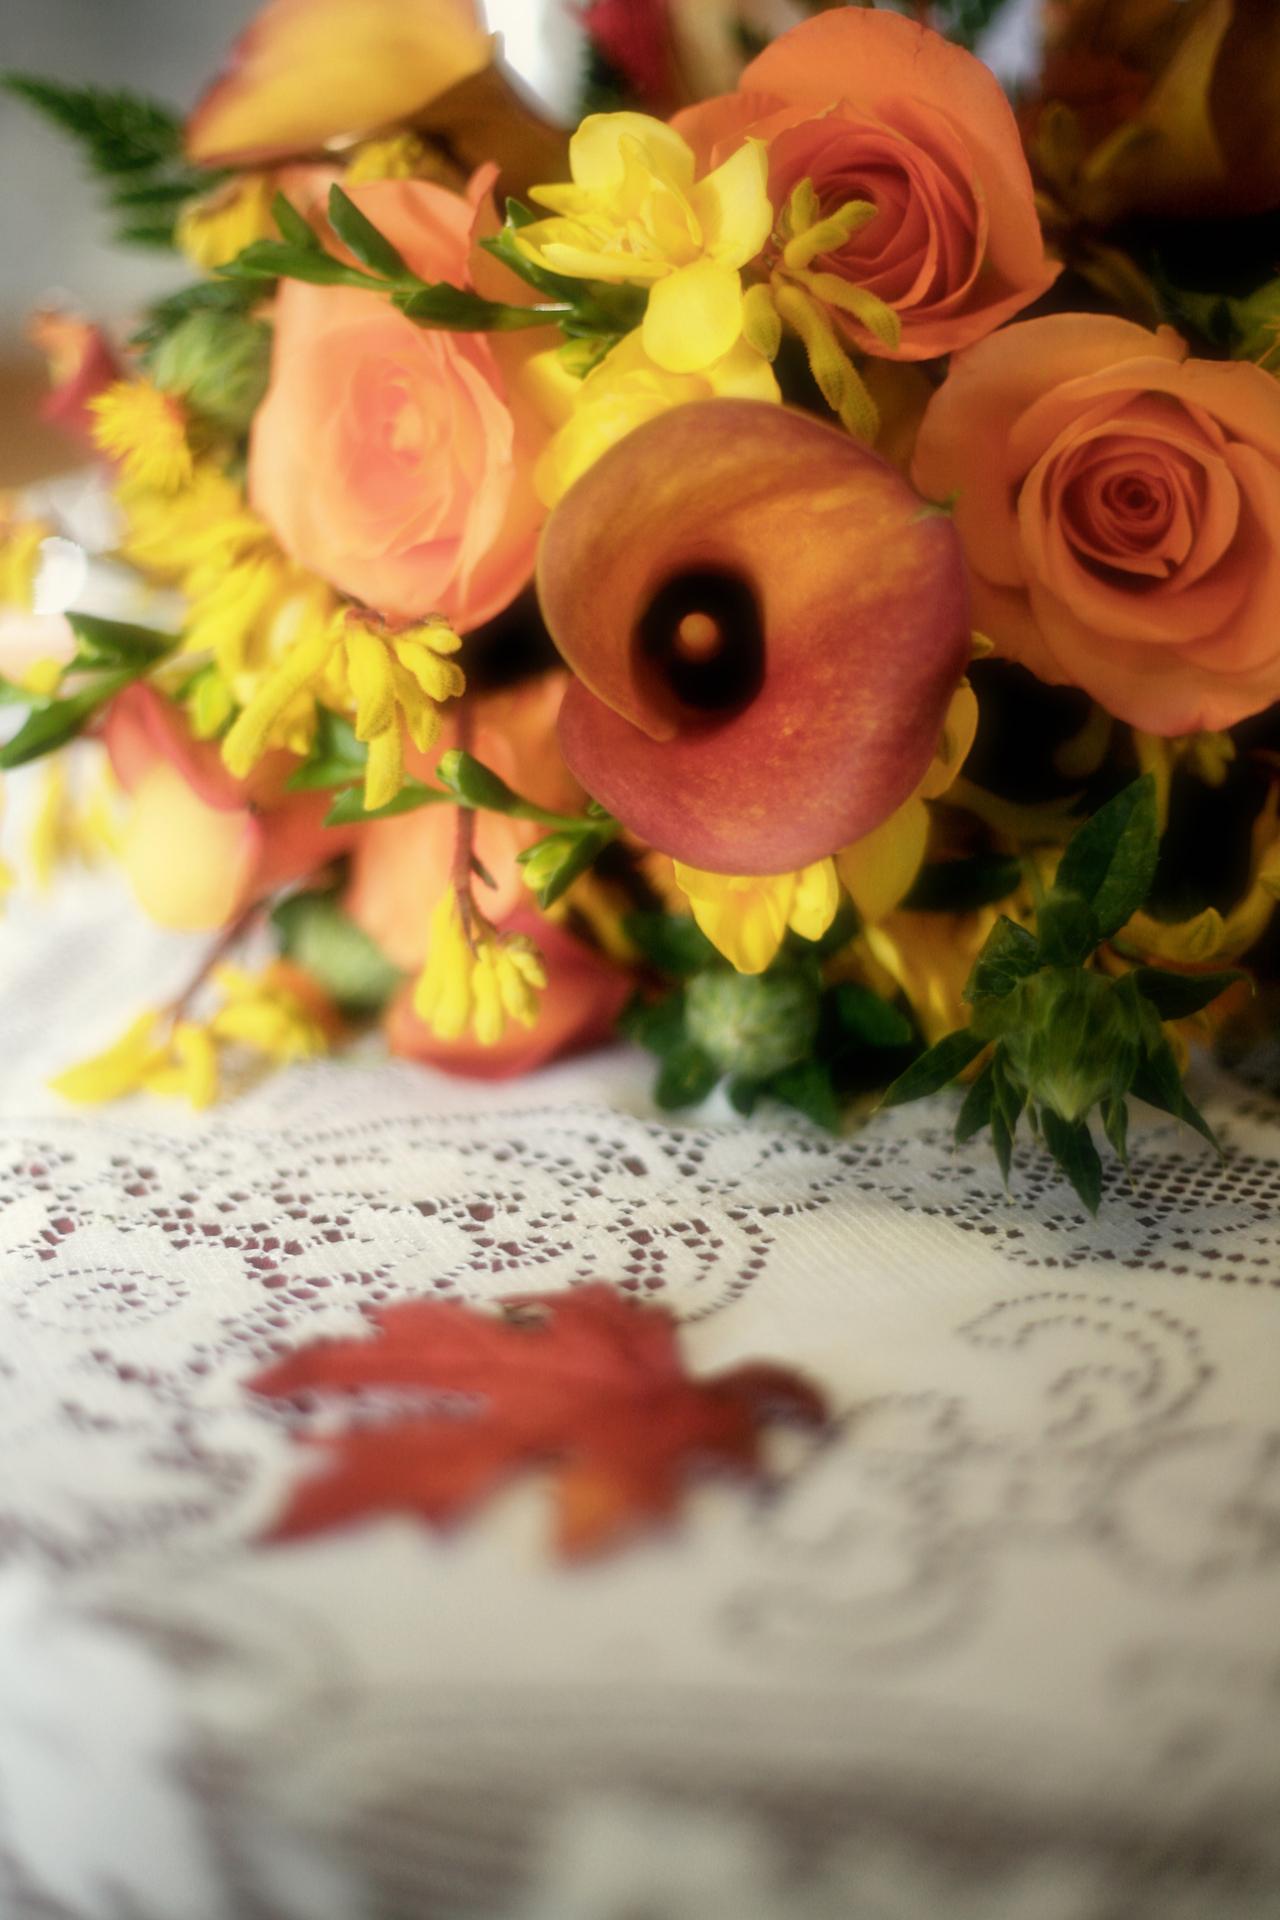 A simple yet stunning autumn centrepiece